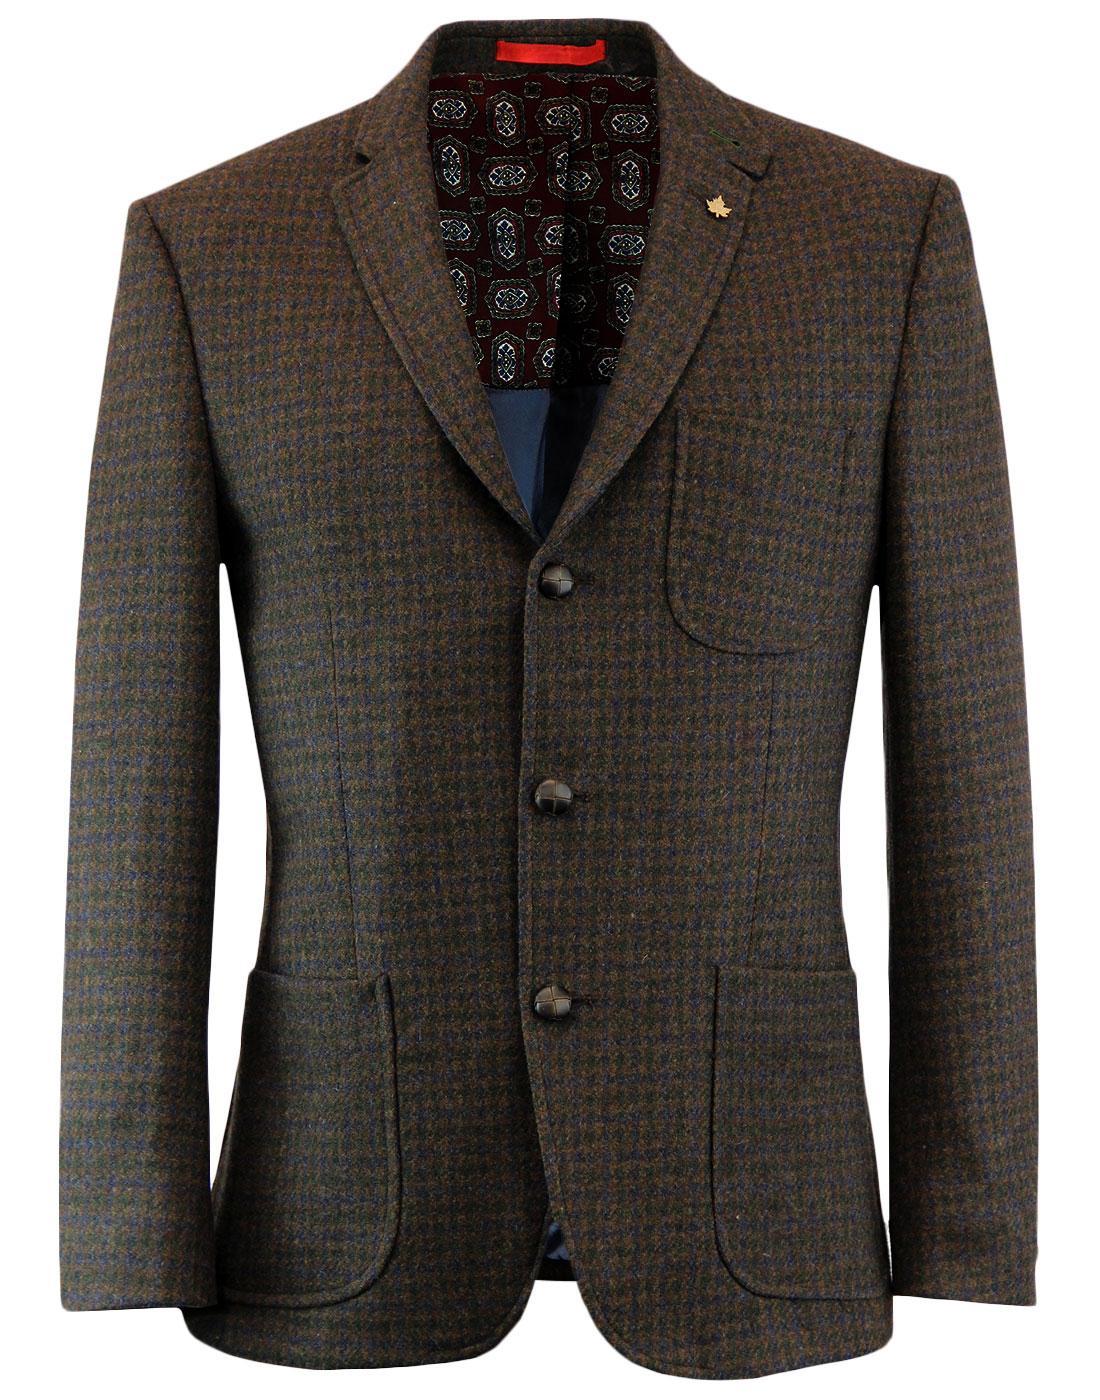 Retro Mod 3 Button Dogtooth Check Blazer Jacket